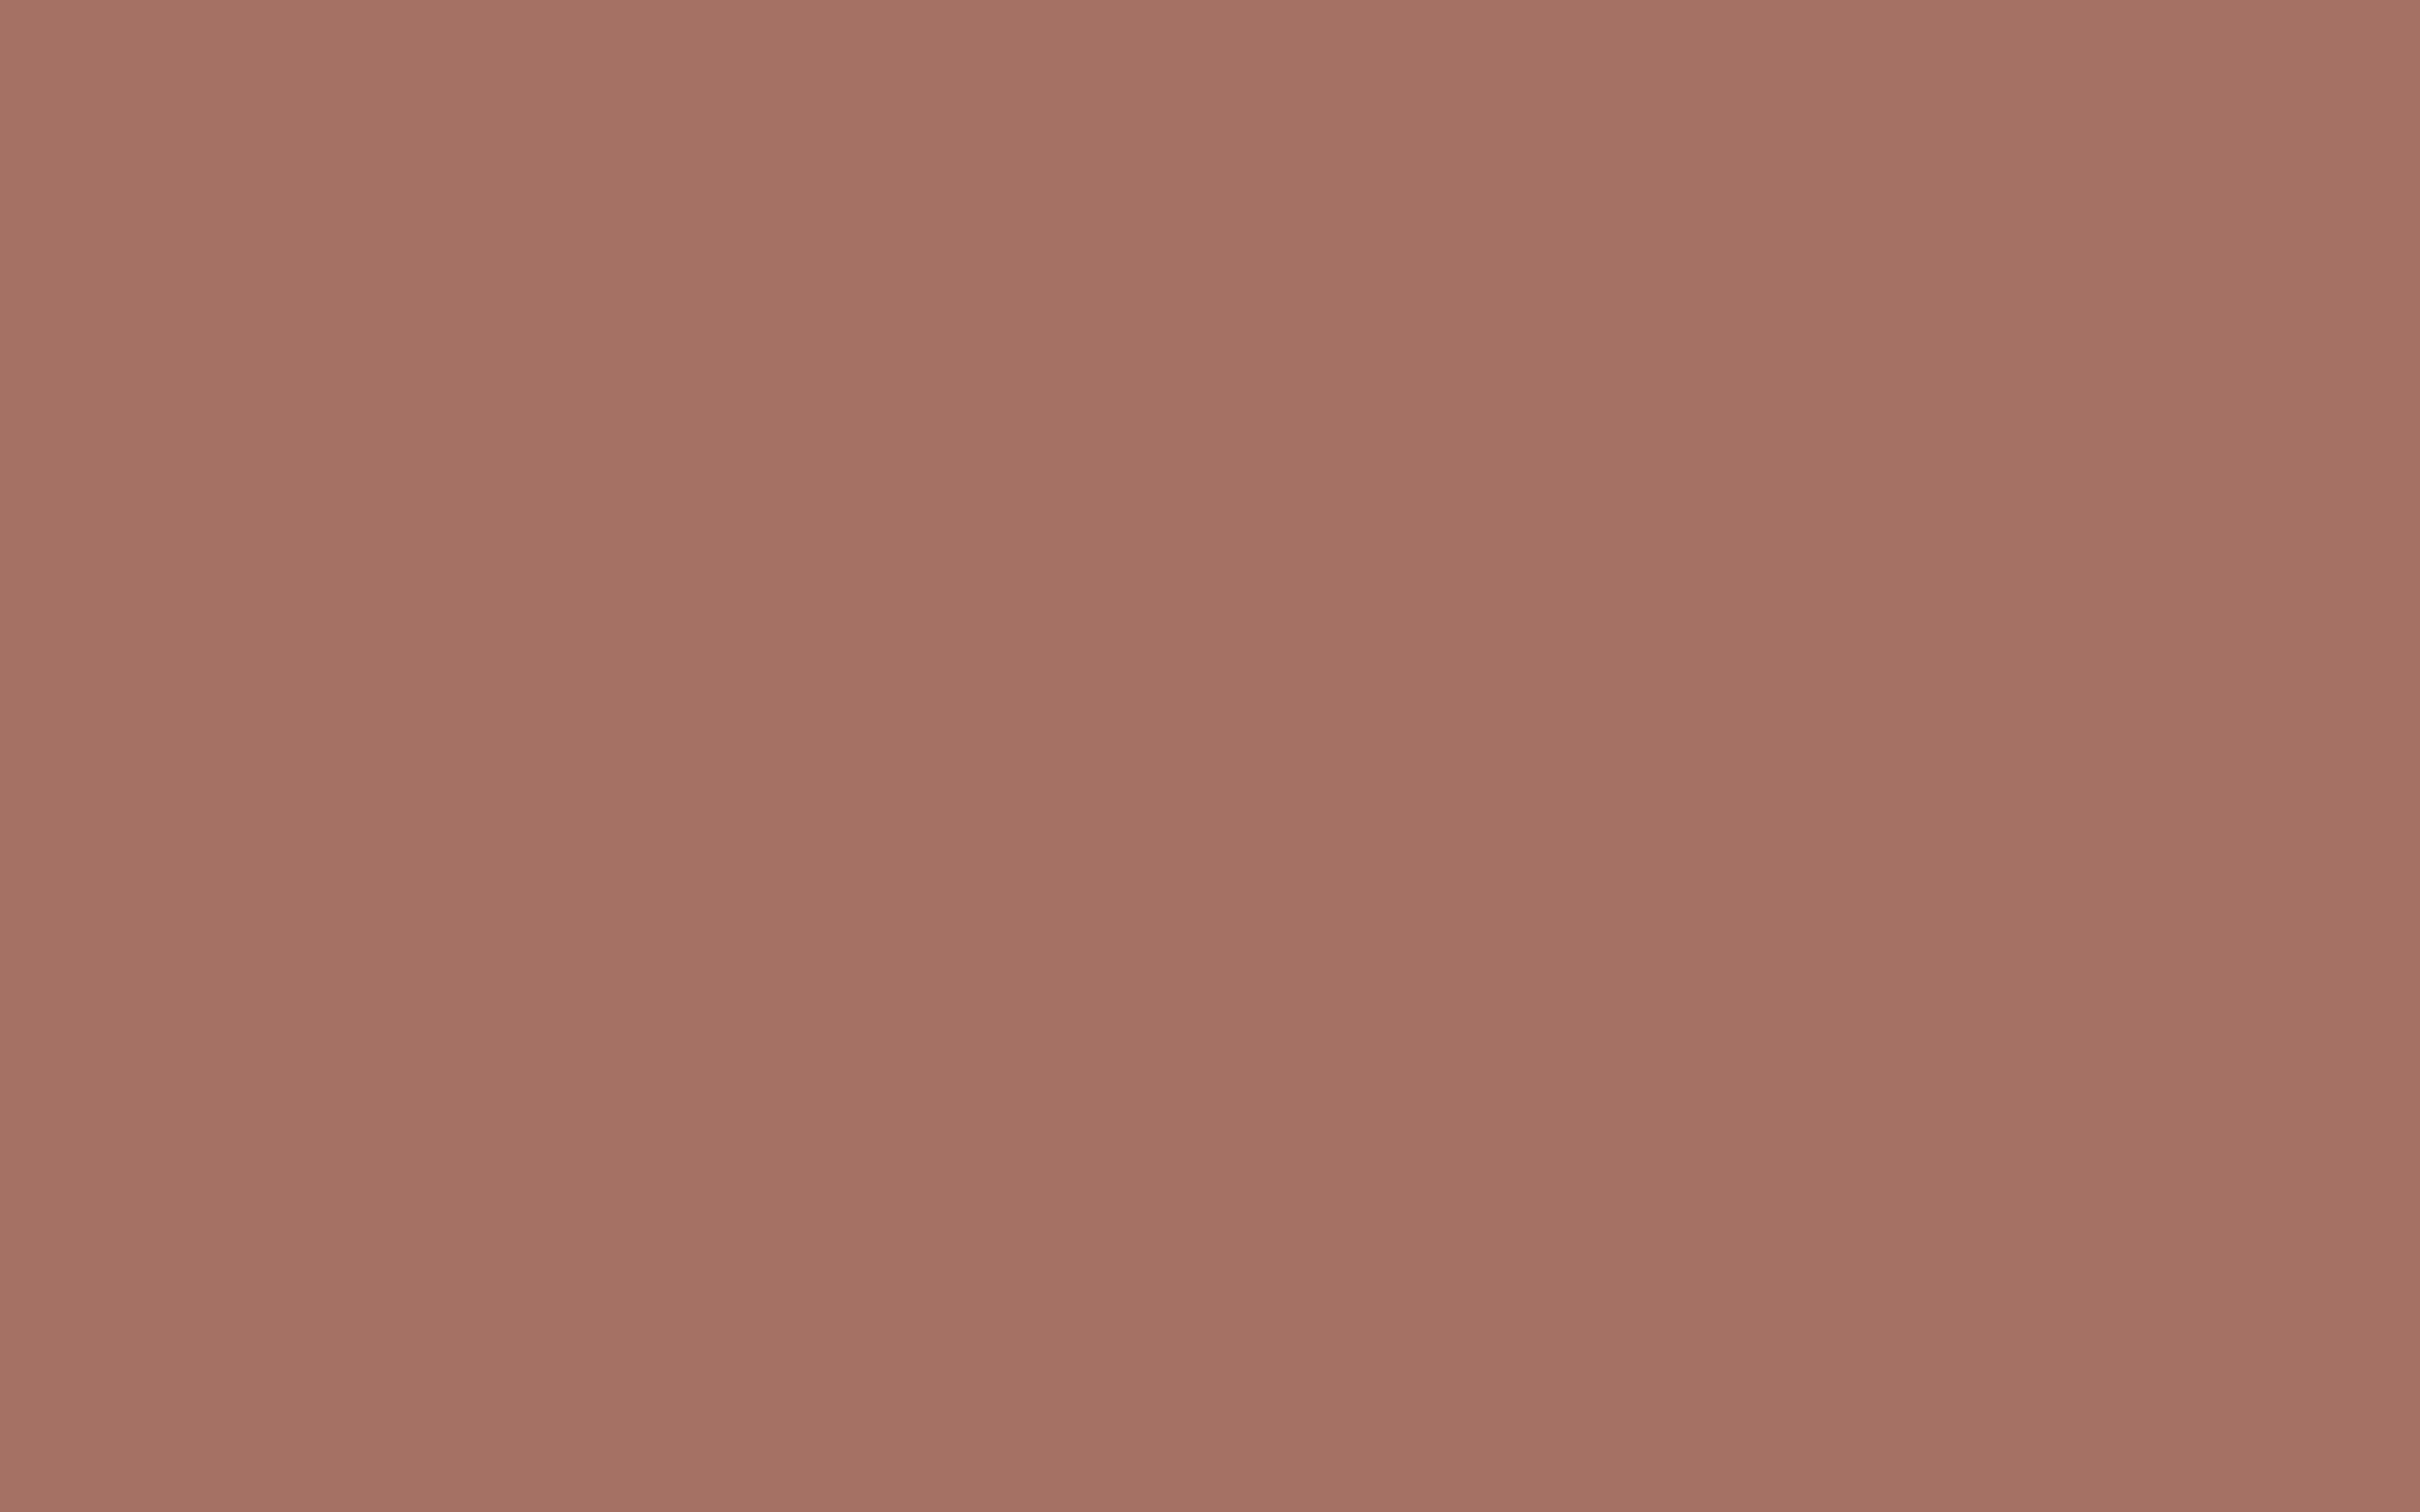 2560x1600 Blast-off Bronze Solid Color Background